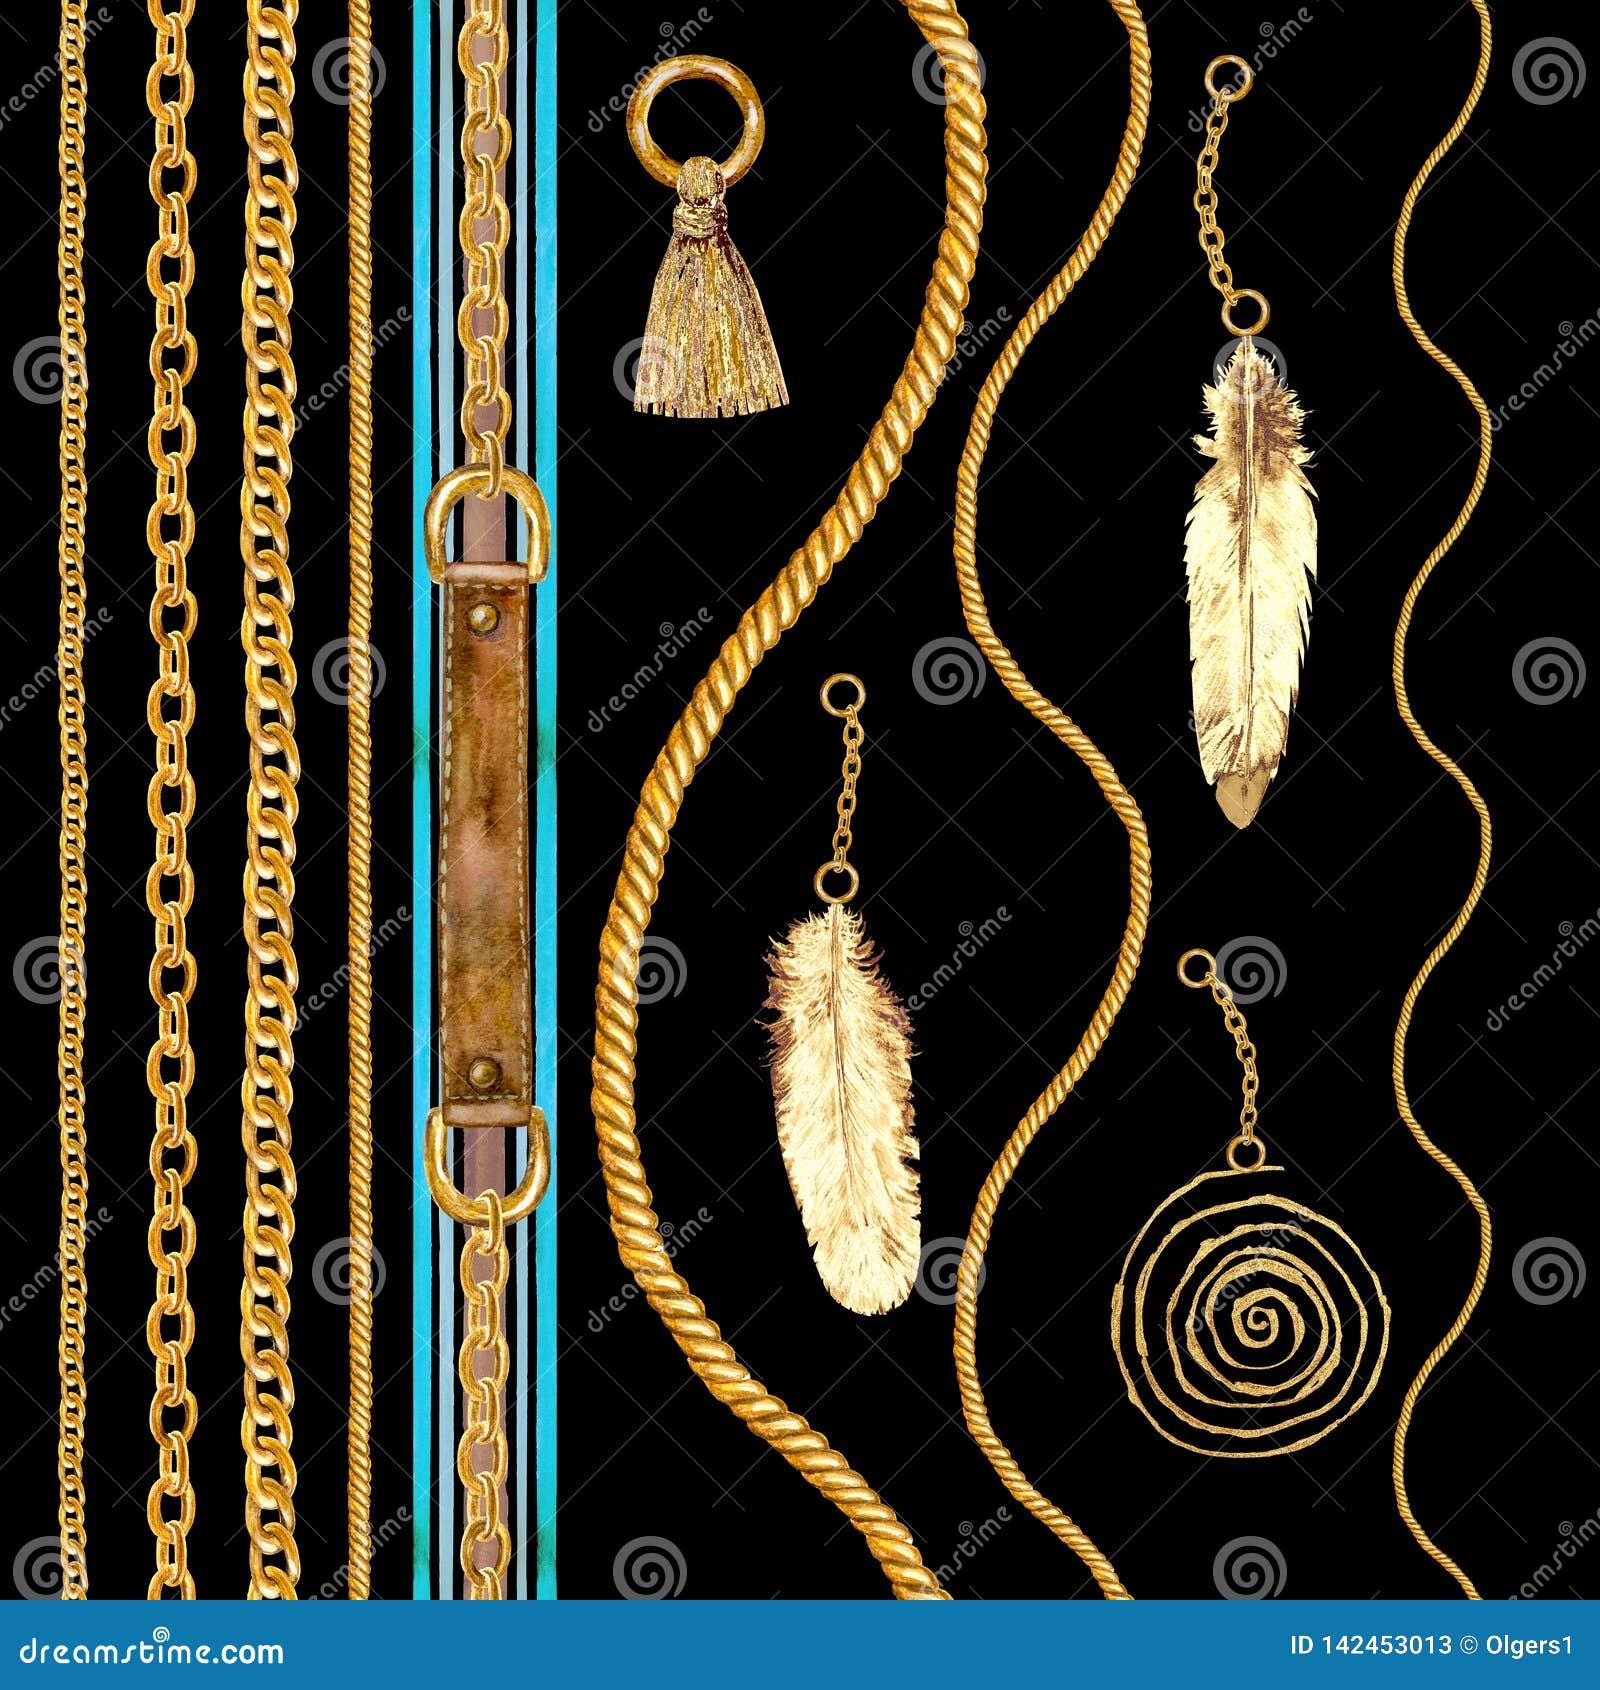 Goldene Kettennahtlose Musterillustration des zaubers Aquarellbeschaffenheit mit goldenen Ketten